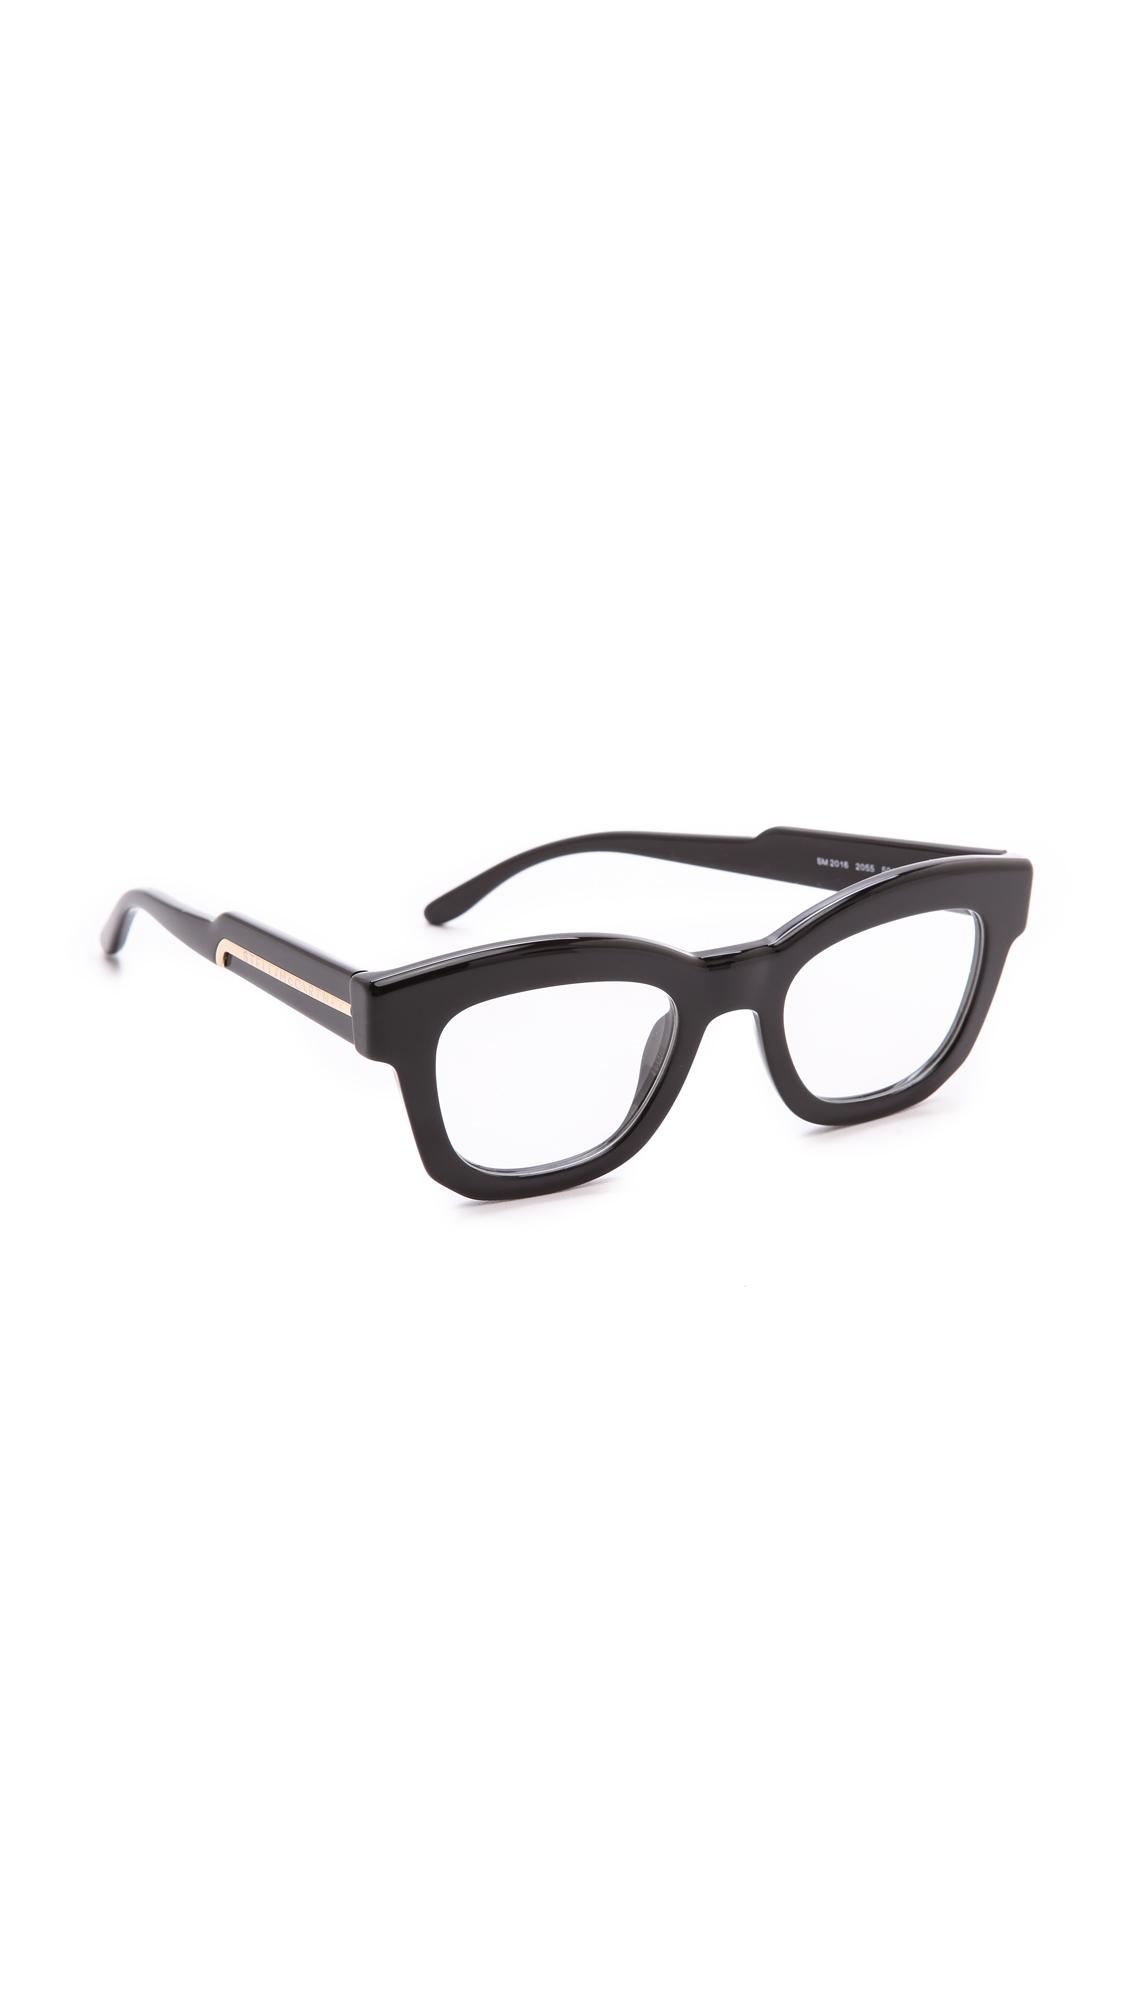 1c070e5eba Lyst - Stella McCartney Thick Frame Glasses - Brown in Black